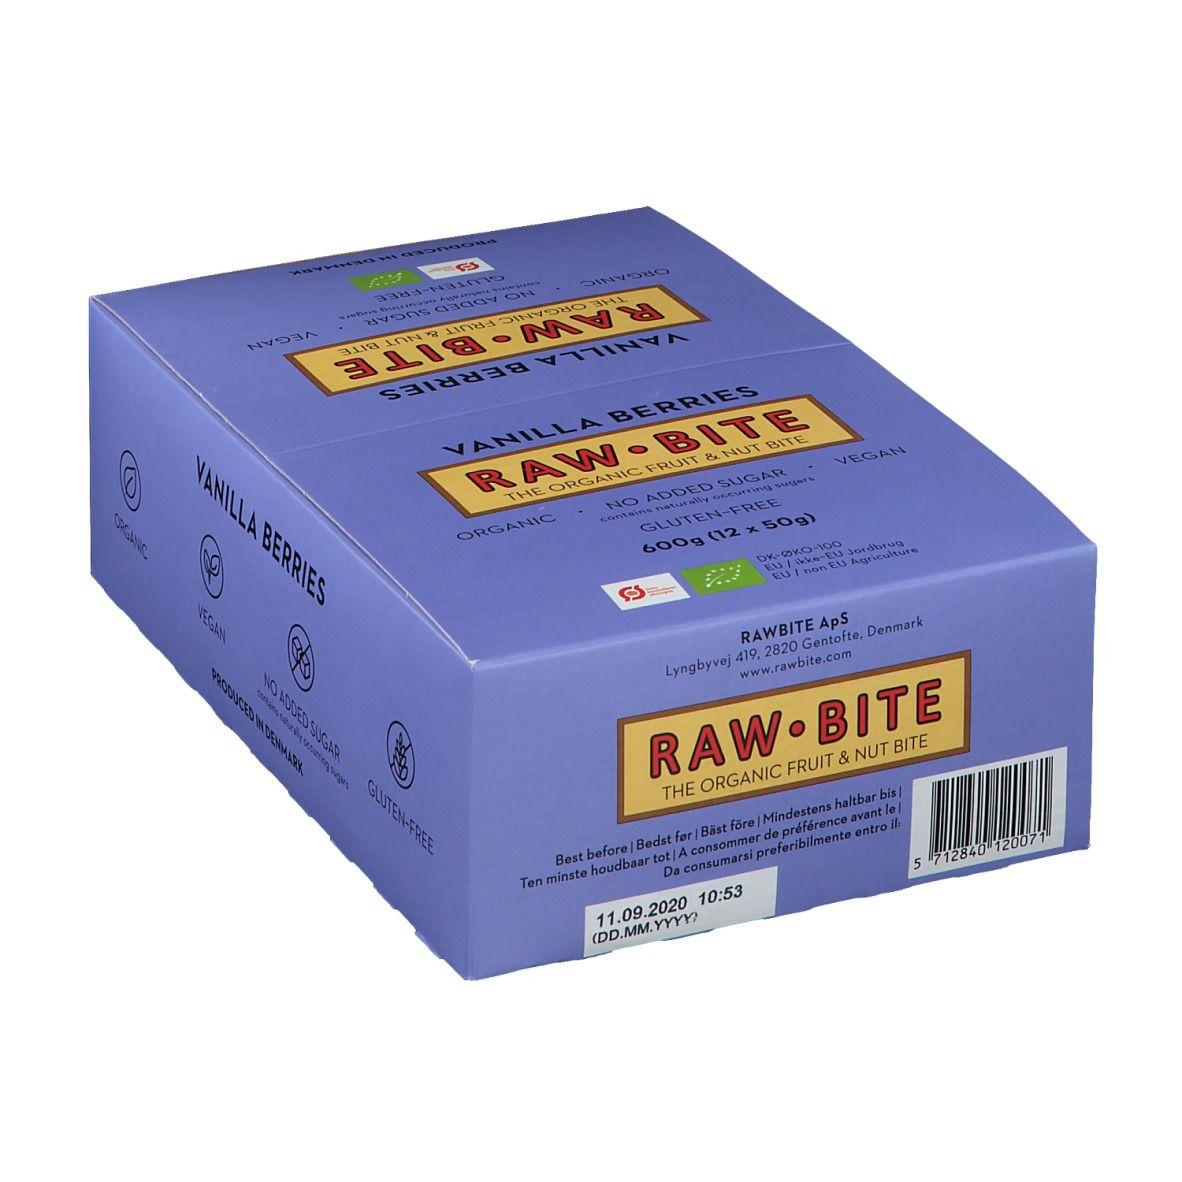 Rawbite RAW BITE Bio Barres Baies de vanille g barre(s)